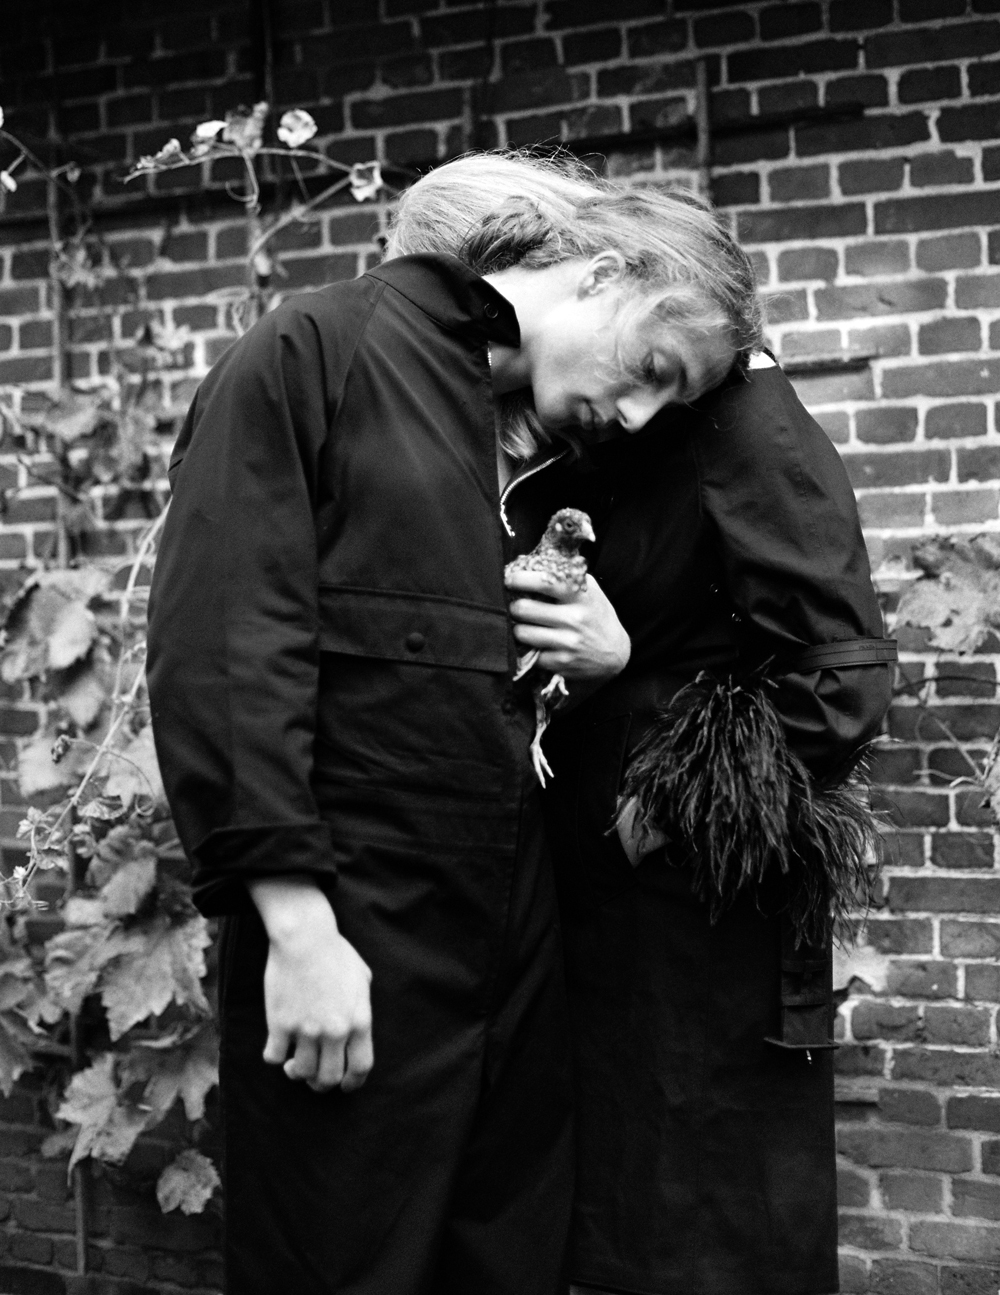 Lou-Schoof-and-Nils-Schoof-by-Onin-Lorente-for-LOfficiel-3.jpg